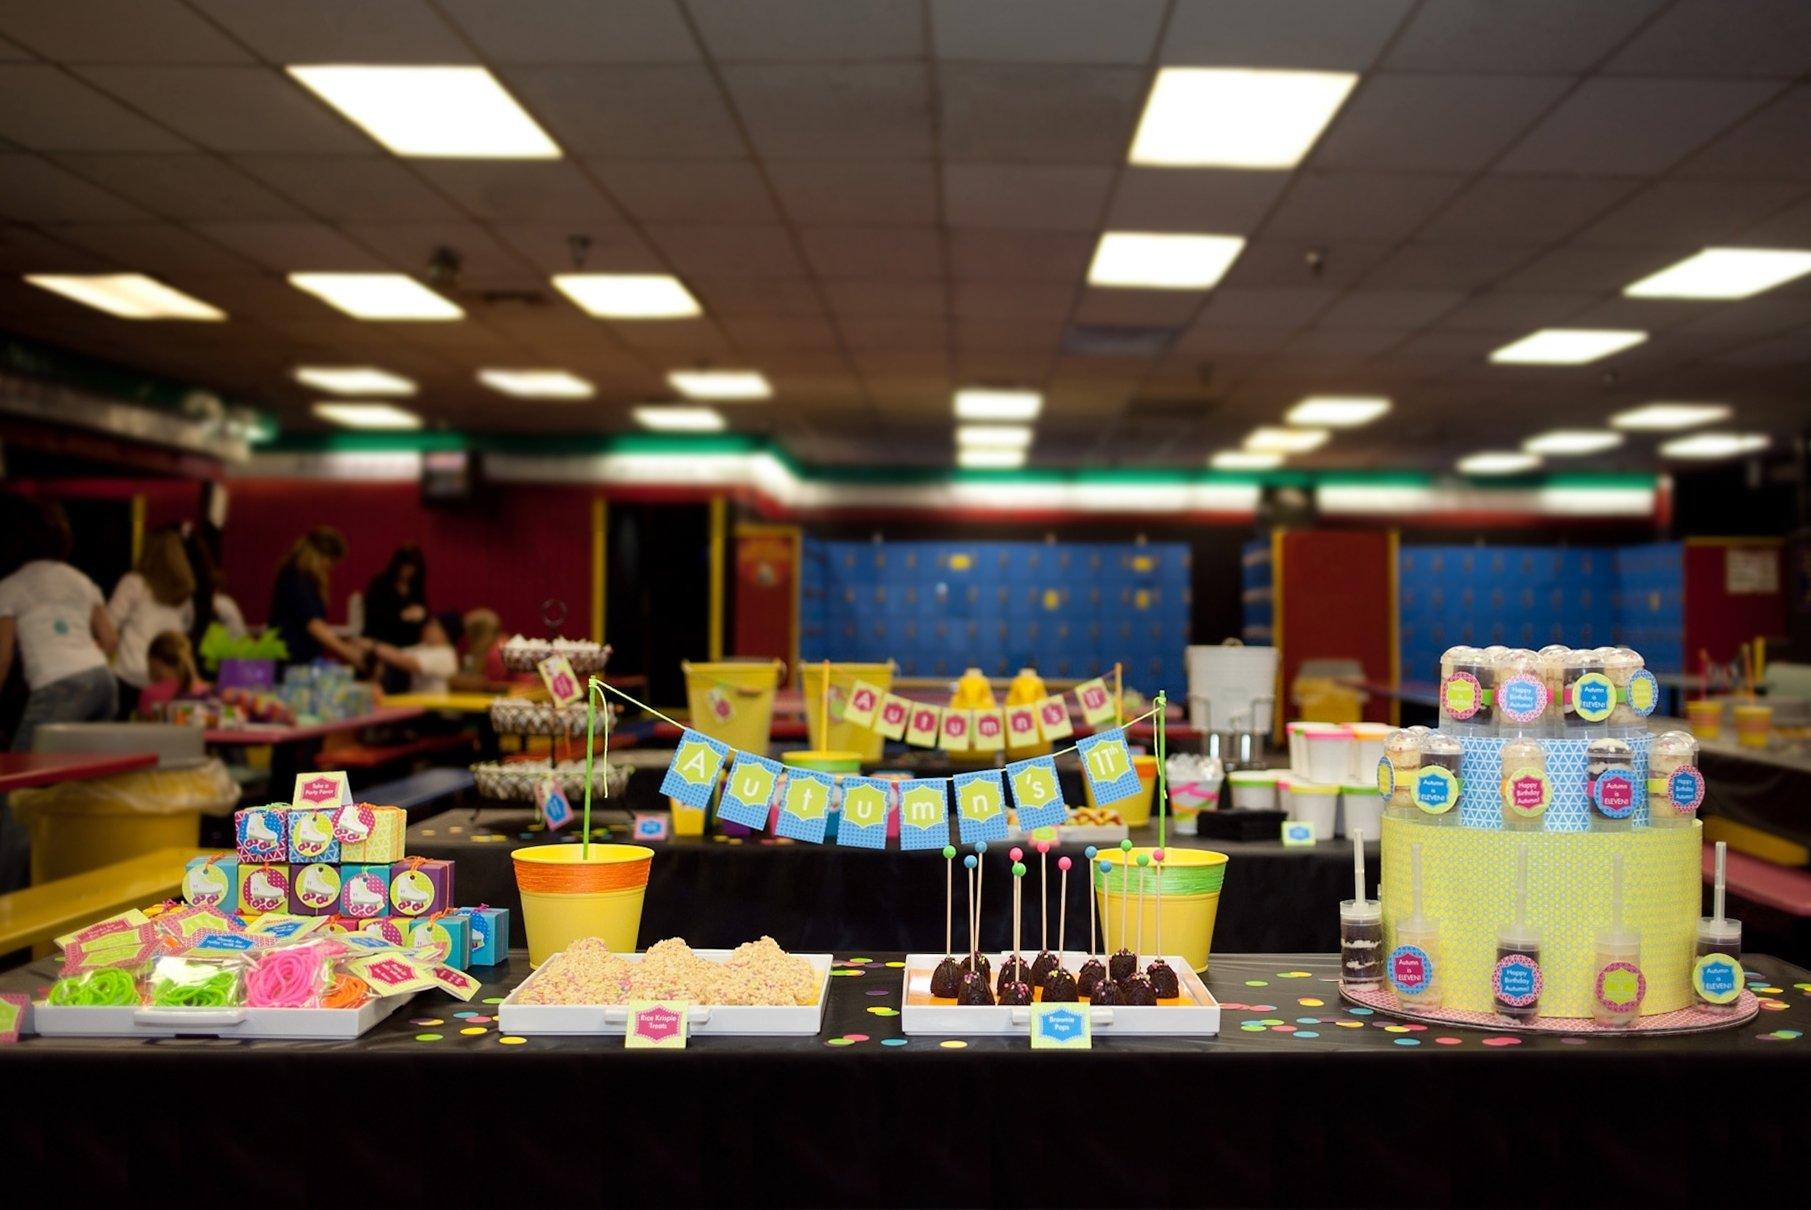 10 Wonderful Roller Skating Birthday Party Ideas birthday party supplies roller skating birthday party supplies 1